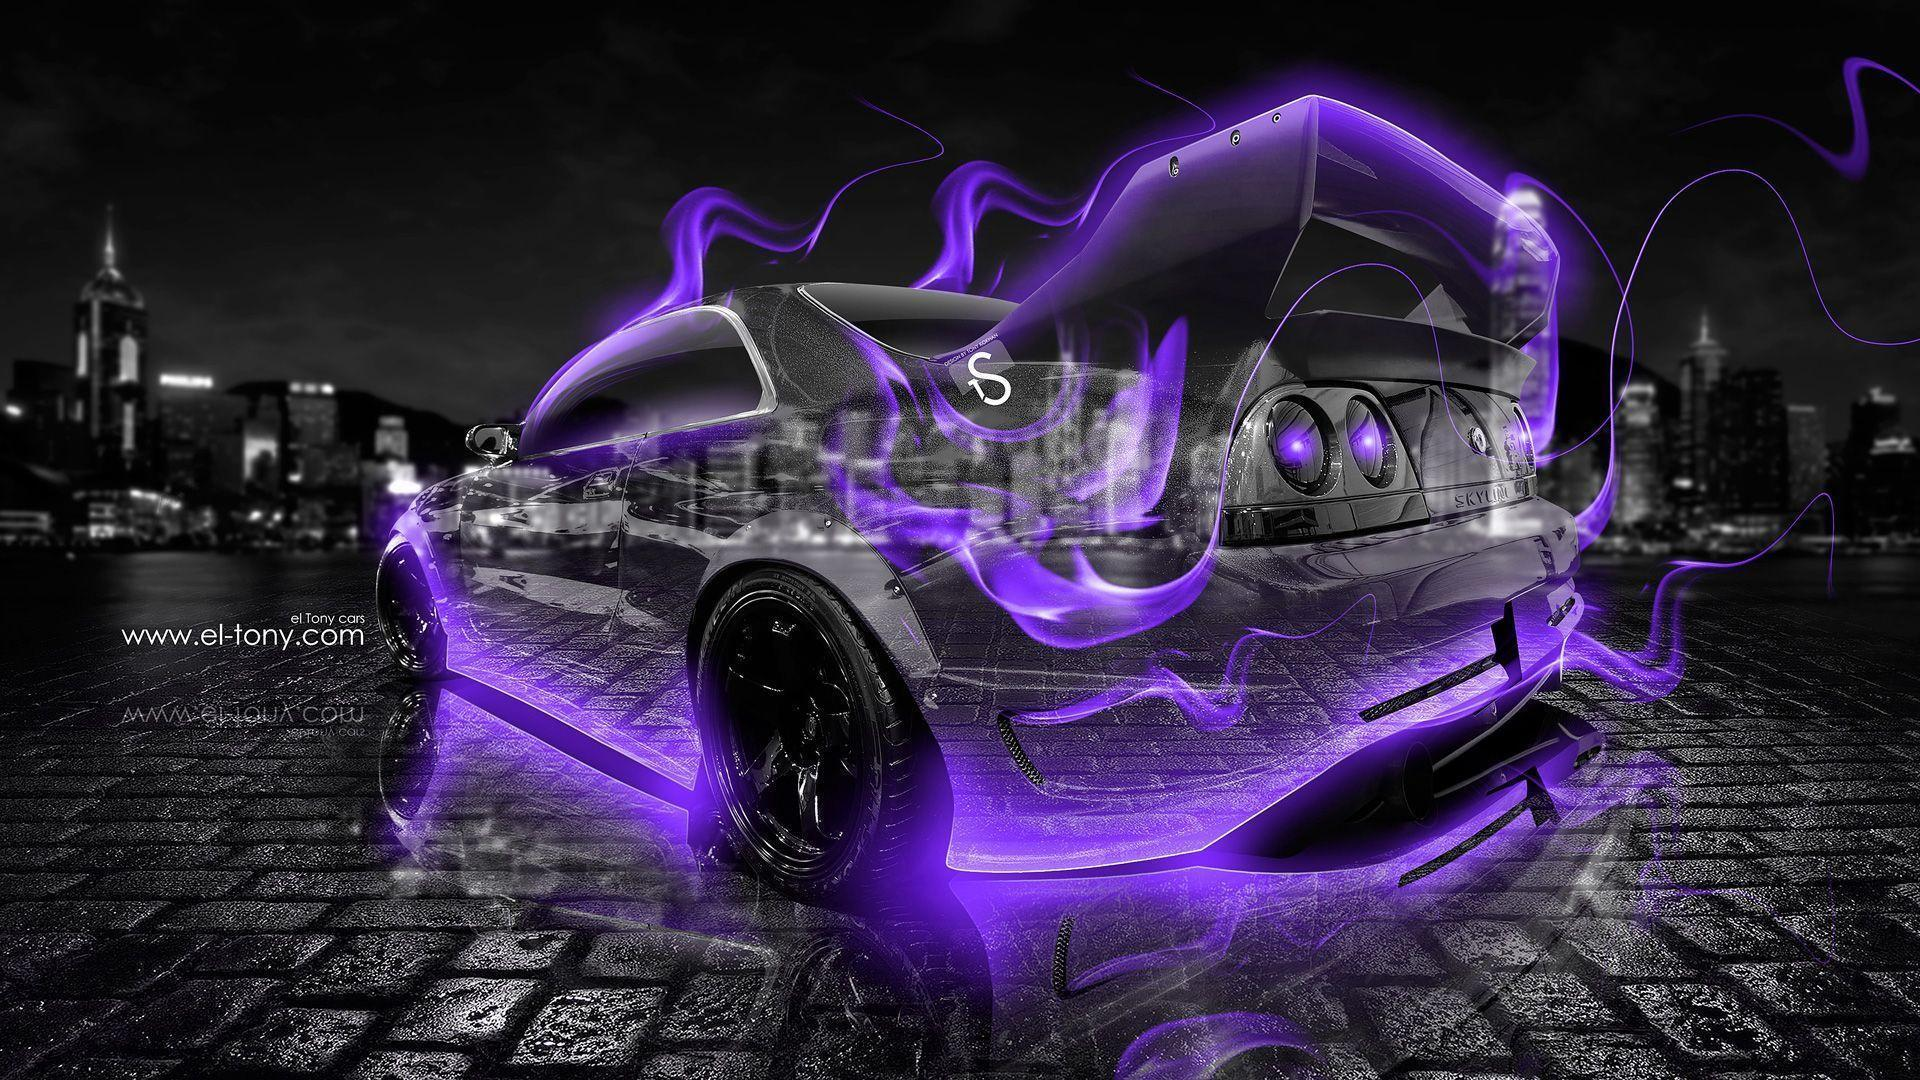 Genial Nissan Skyline GTR R33 JDM Crystal Energy City Car 2014 « El Tony